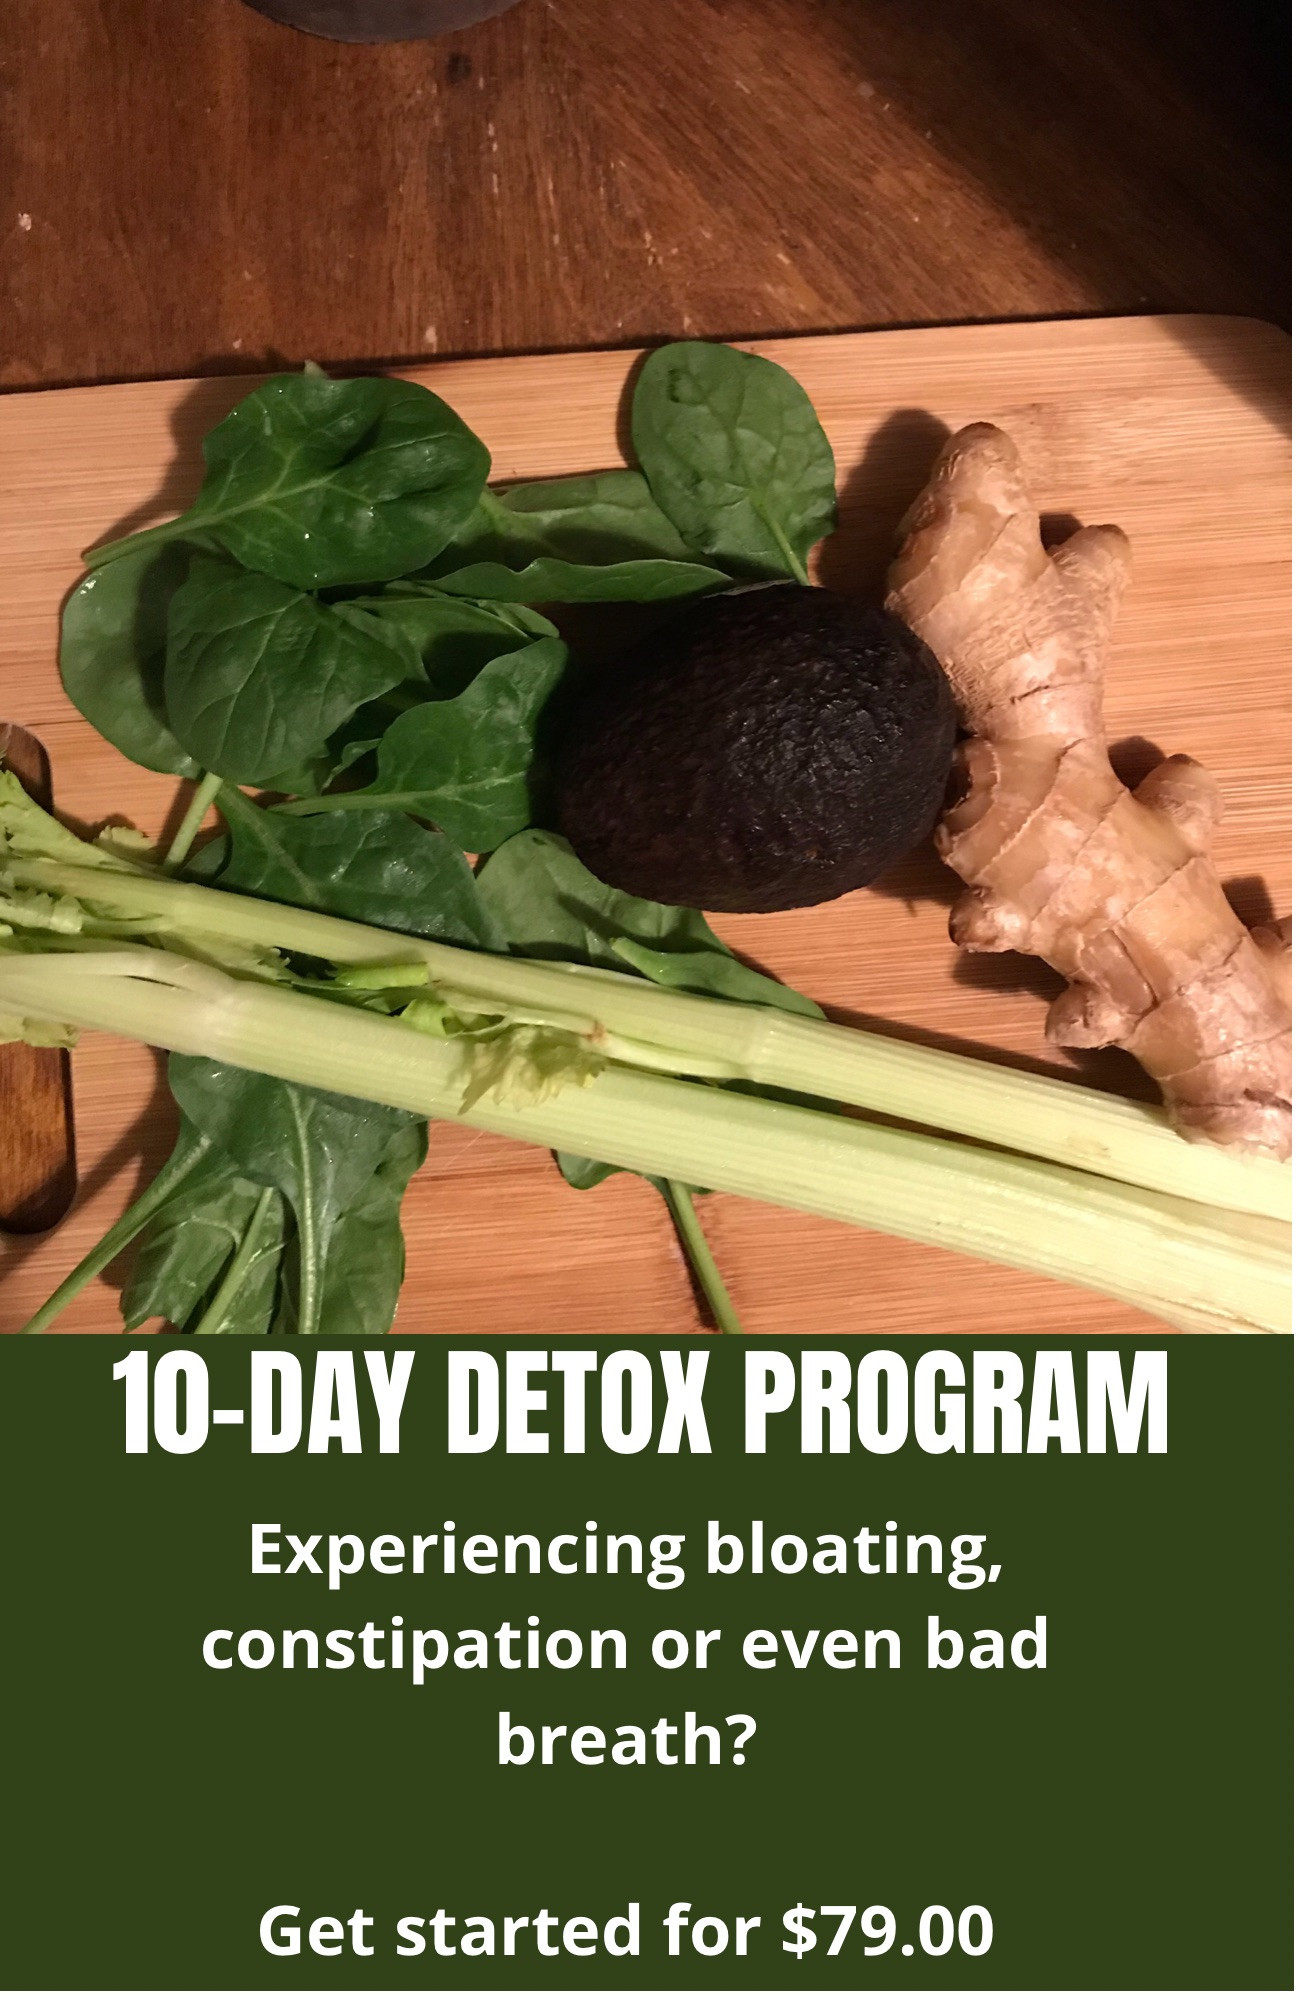 10-Day Detox Program